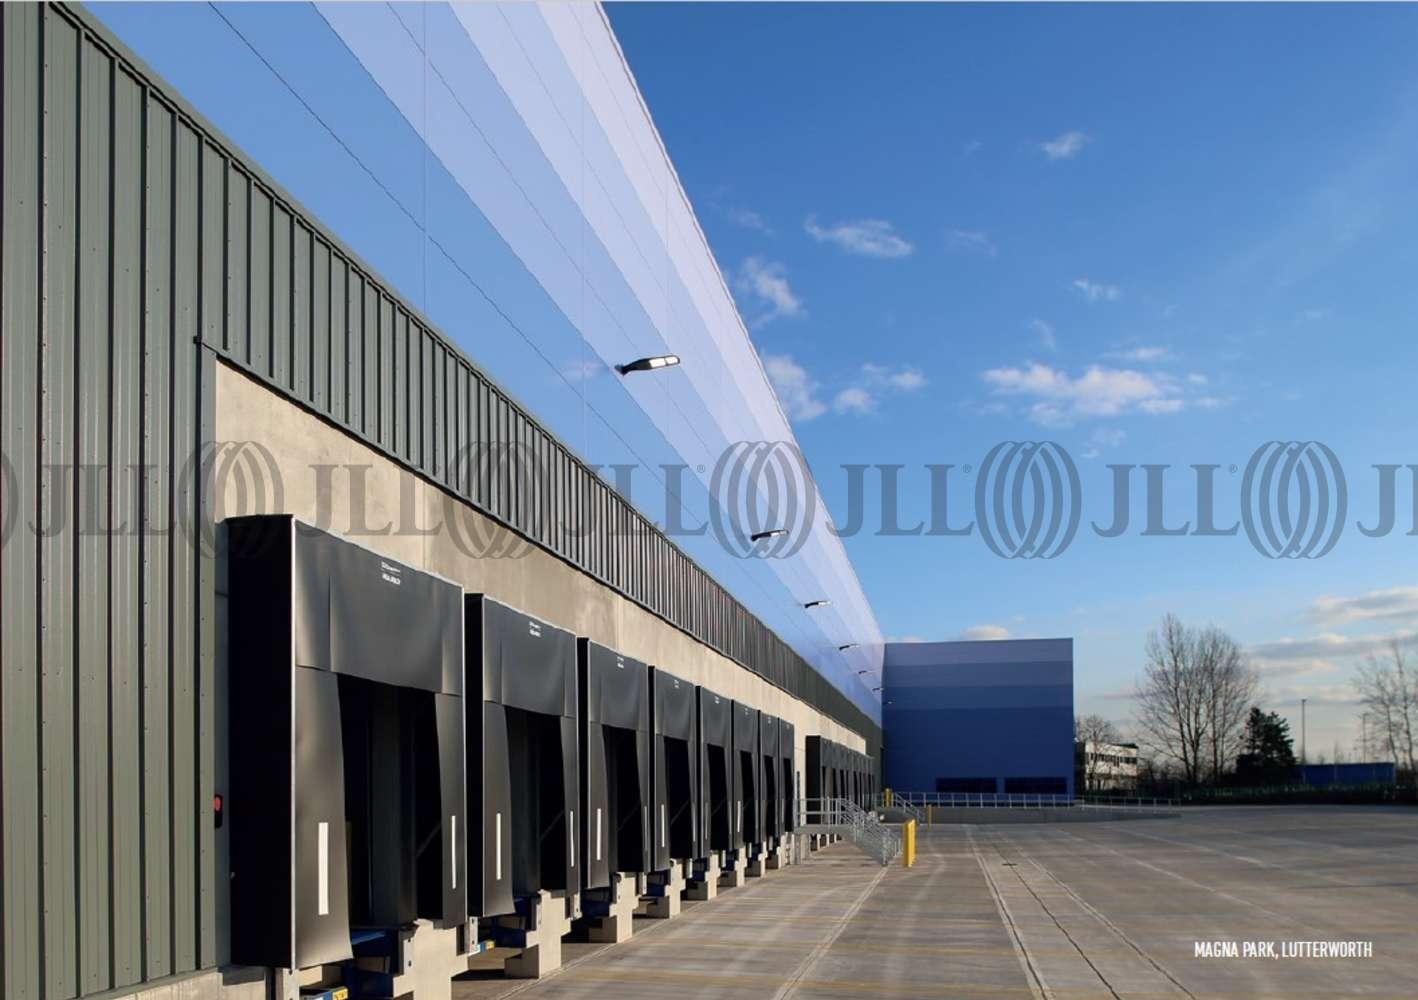 Industrial Lutterworth, LE17 4XT - Hurricane 258, Magna Park - 258